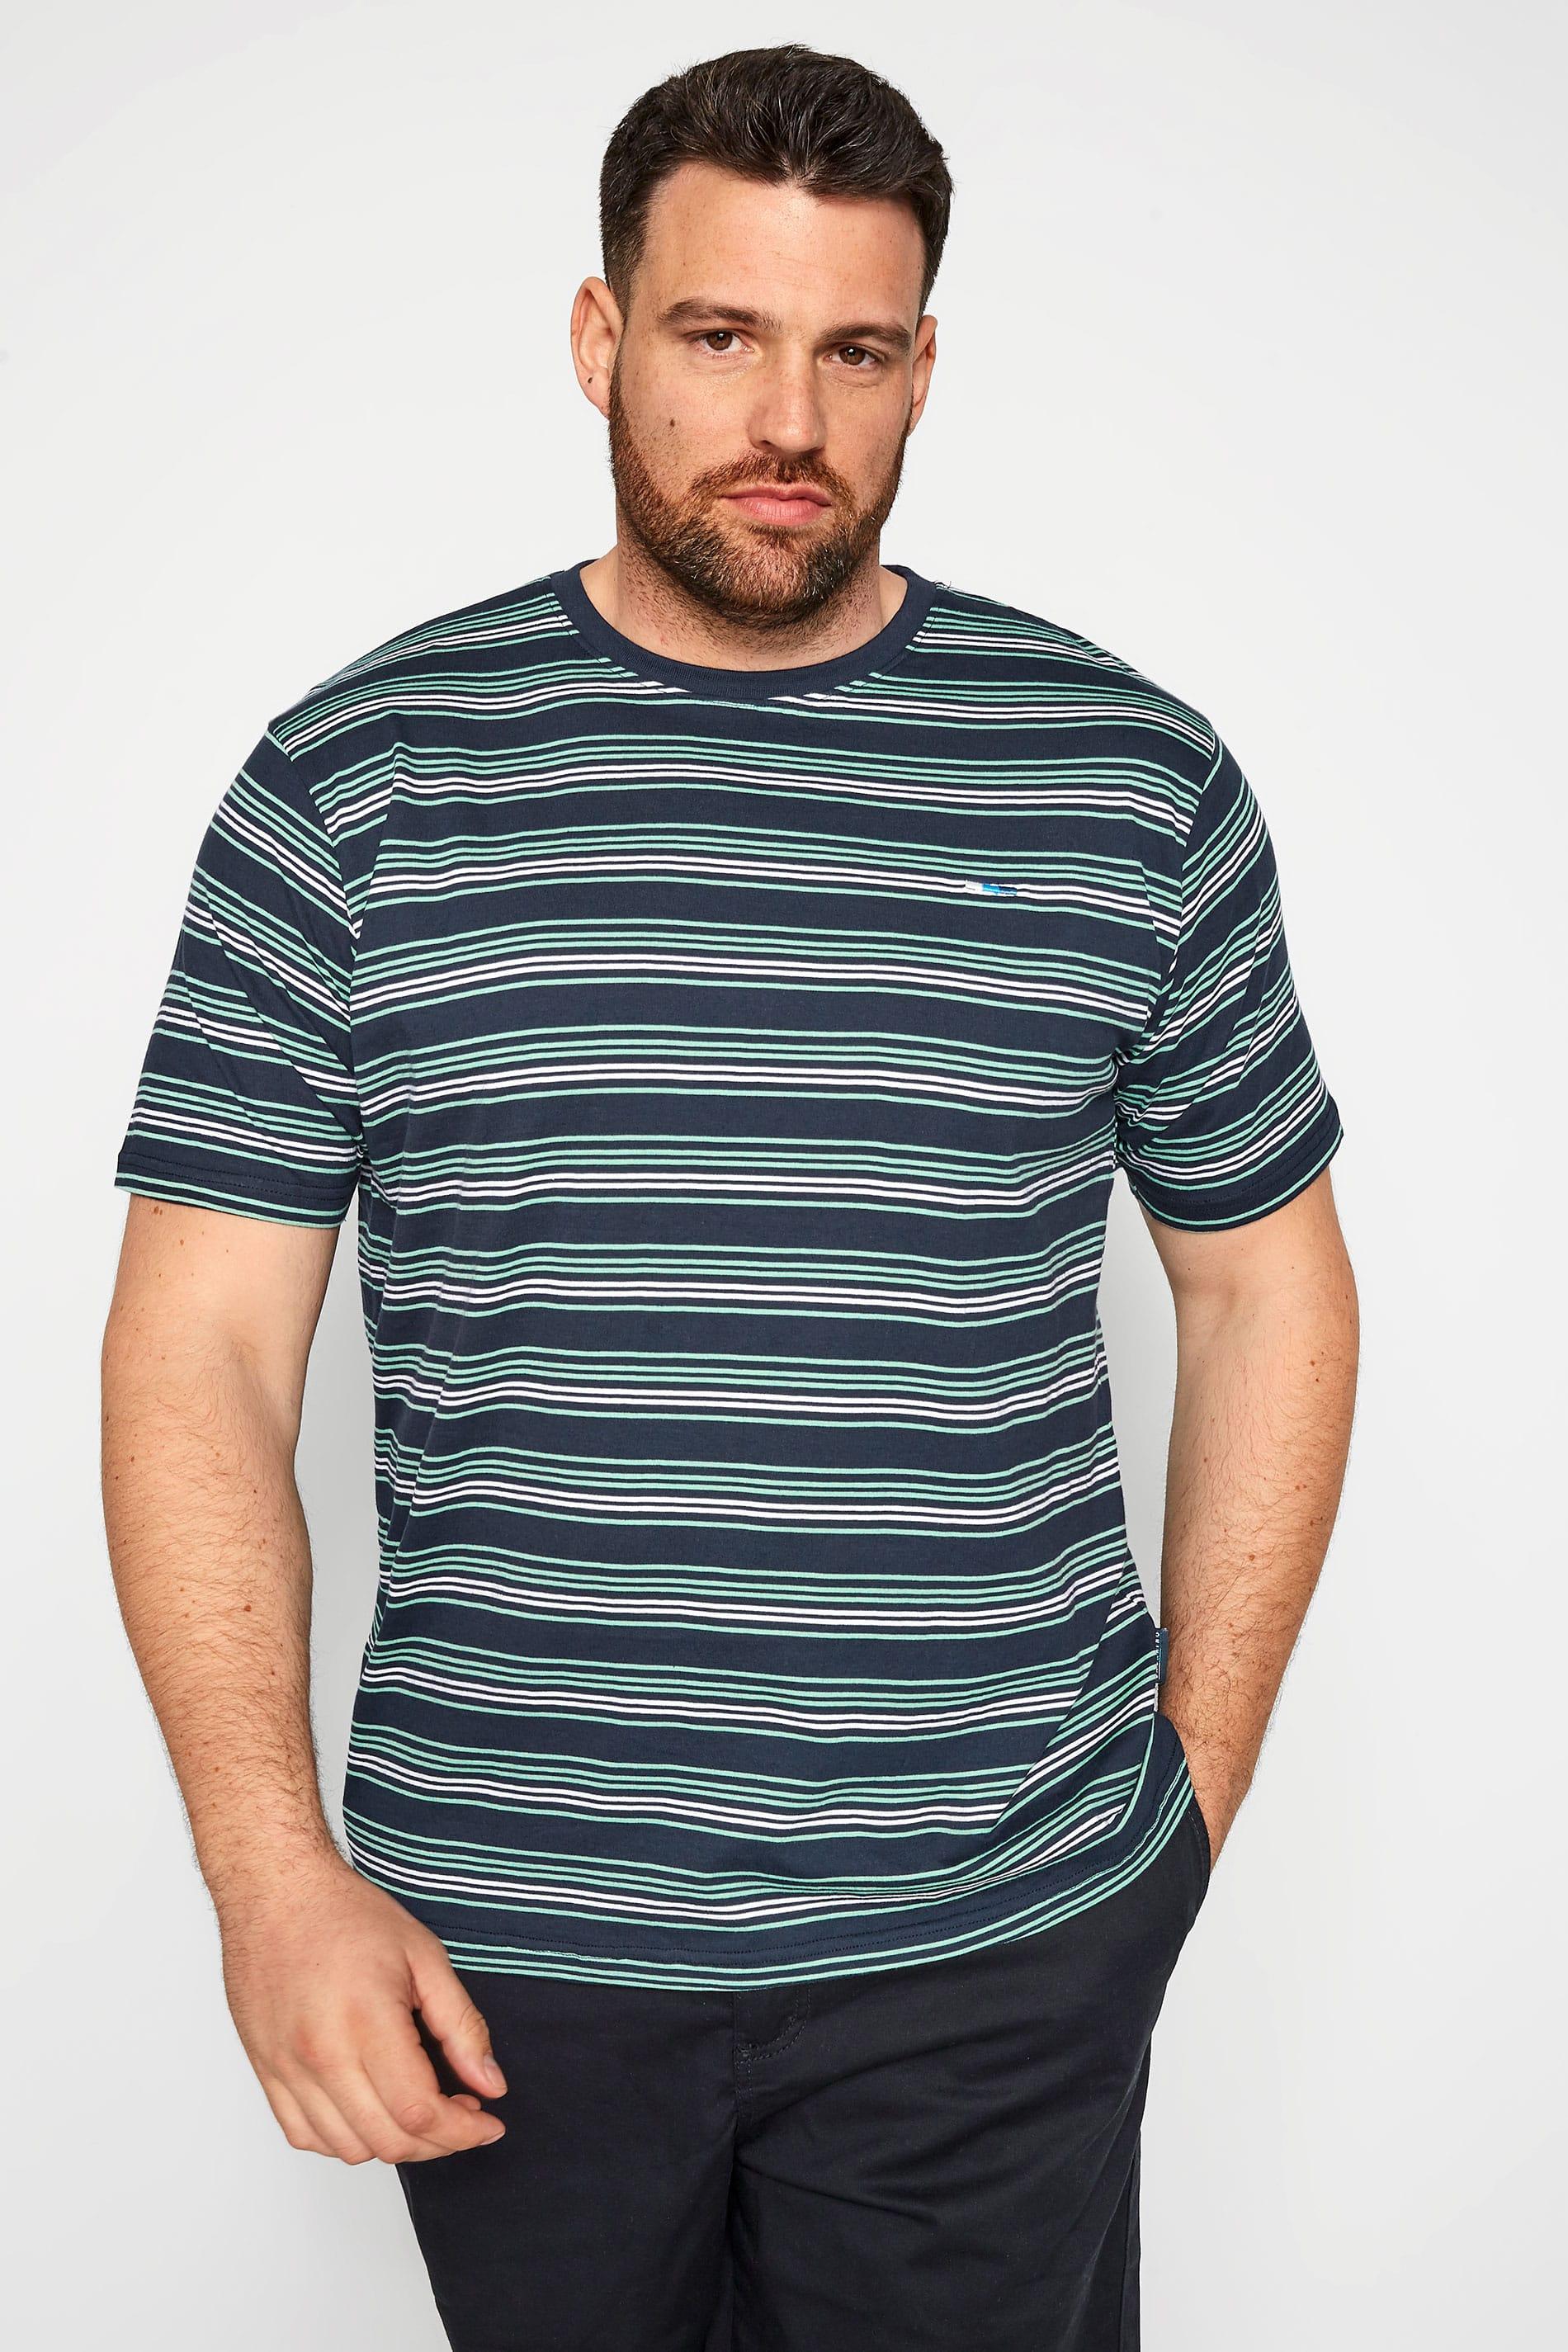 BadRhino Navy & Blue Stripe T-Shirt